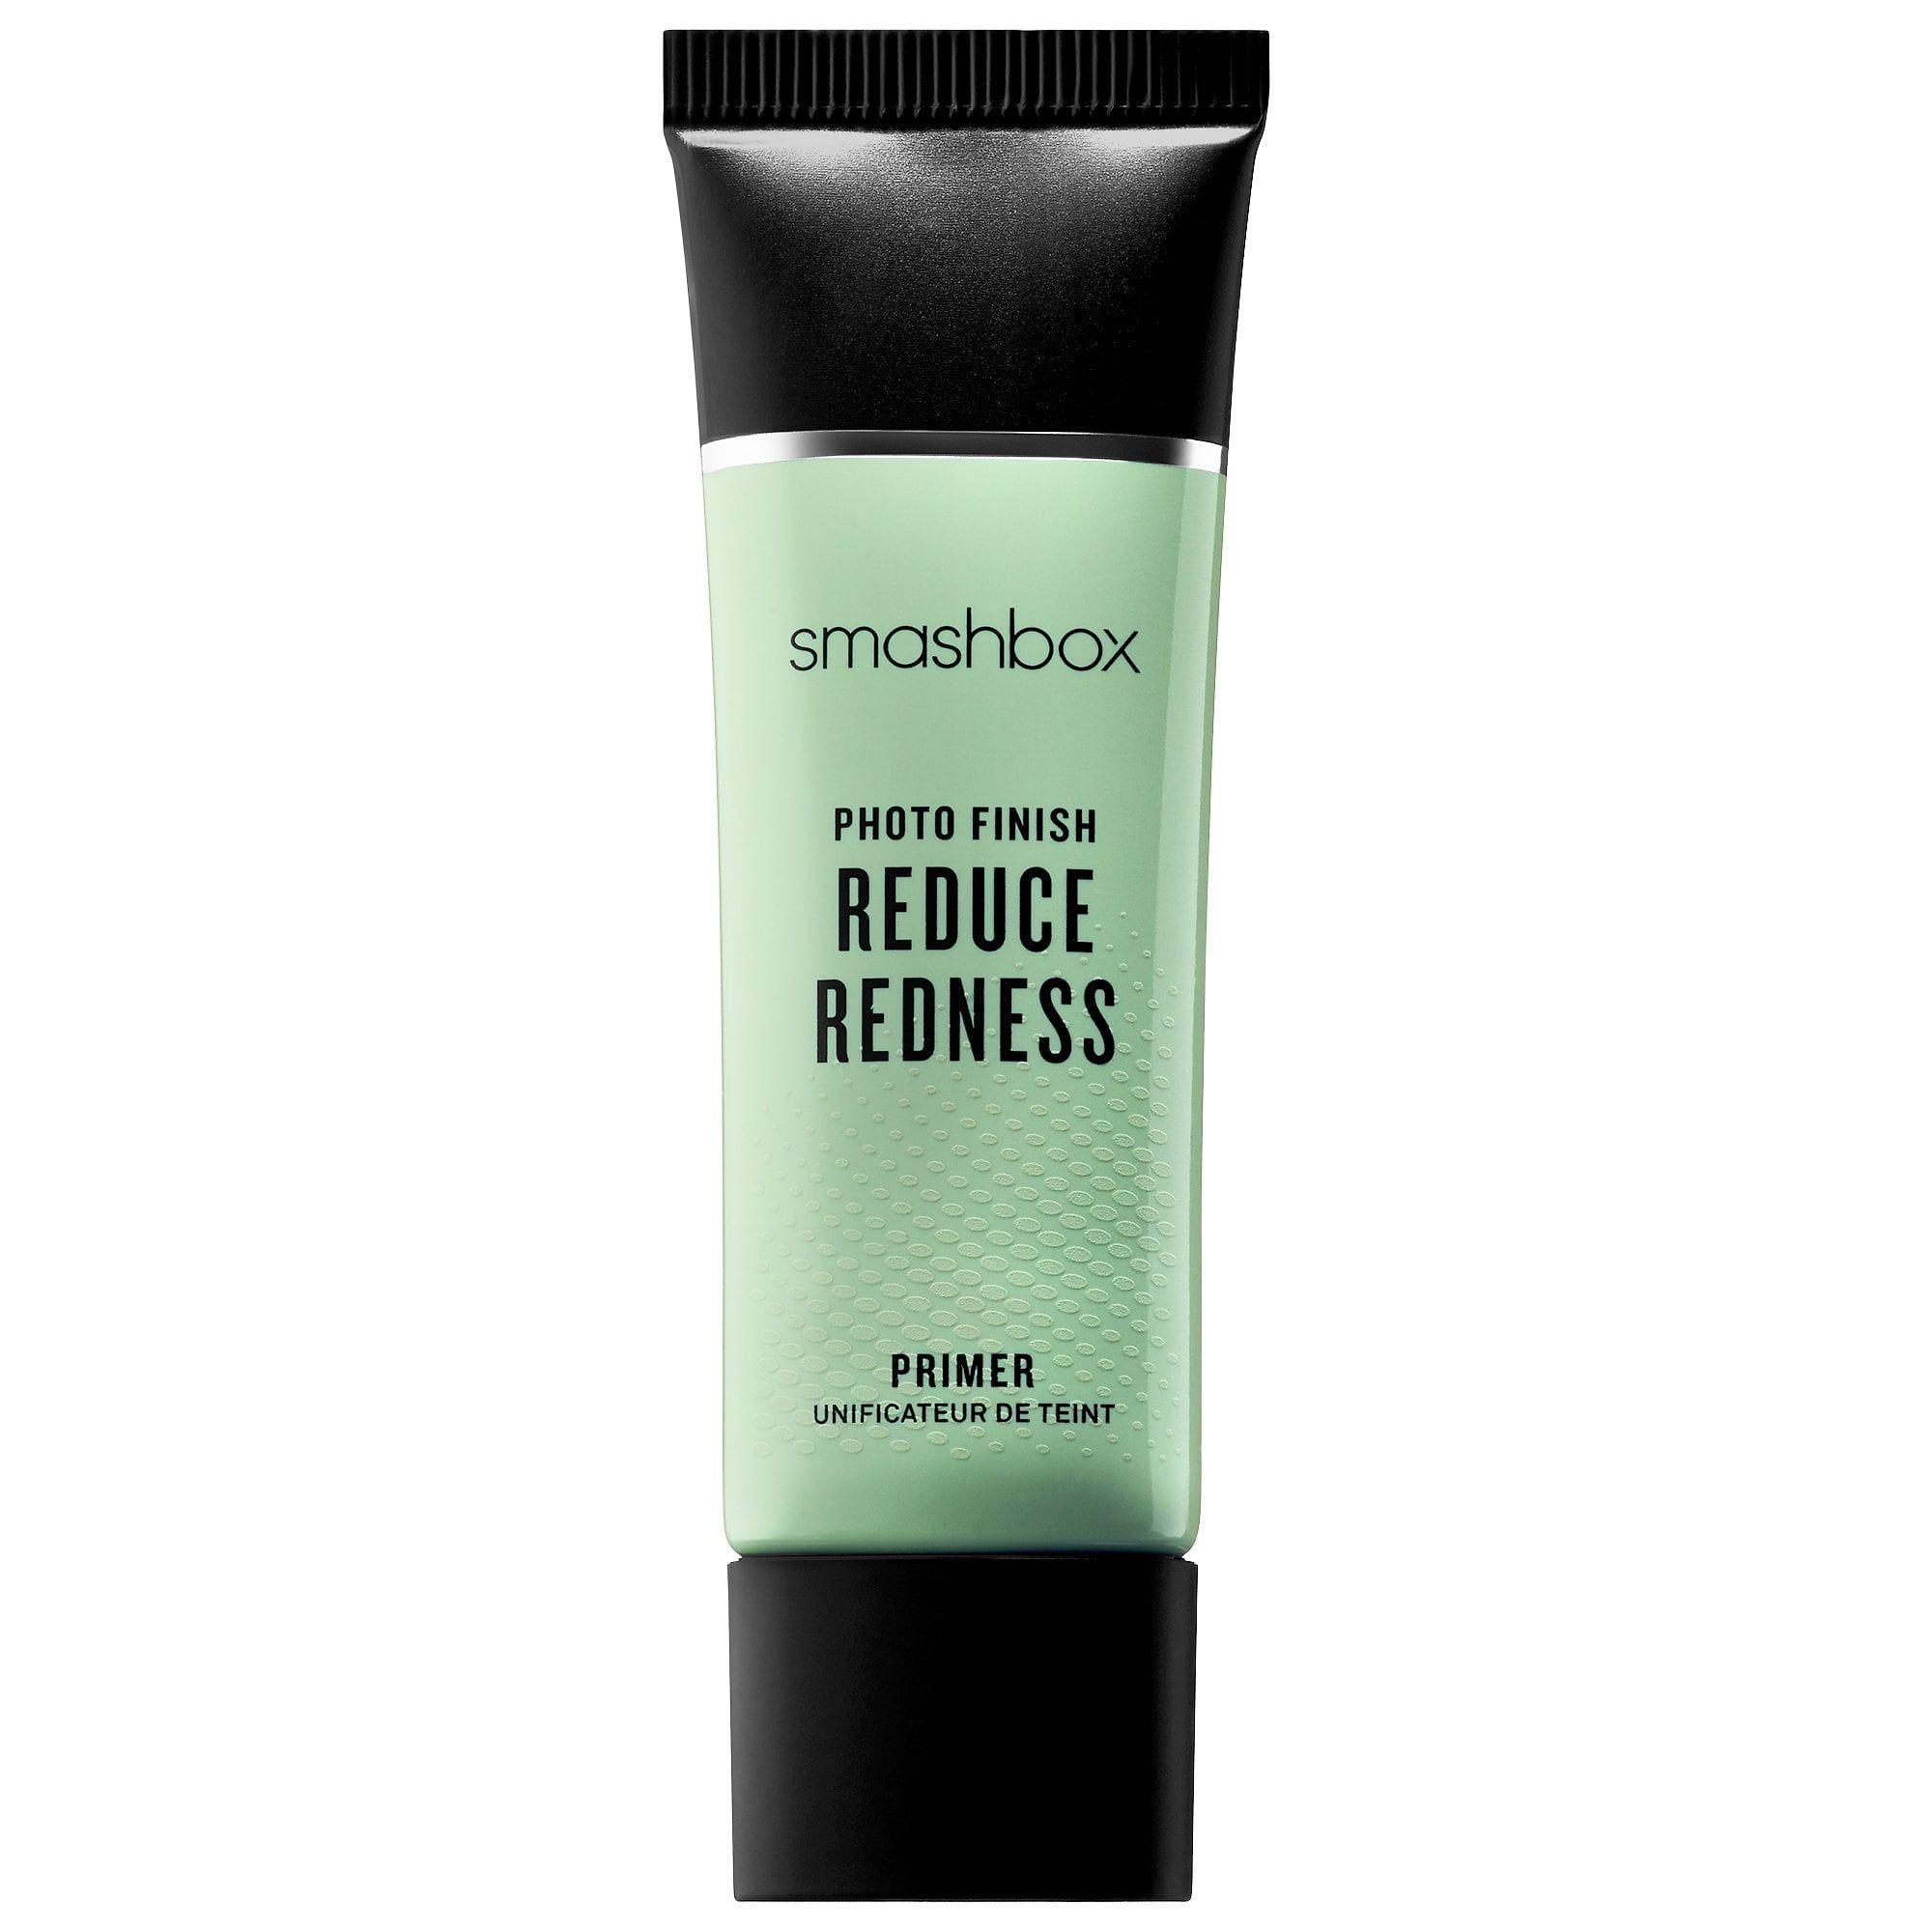 Smashbox Photo Finish Reduce Redness Primer Mini Photo